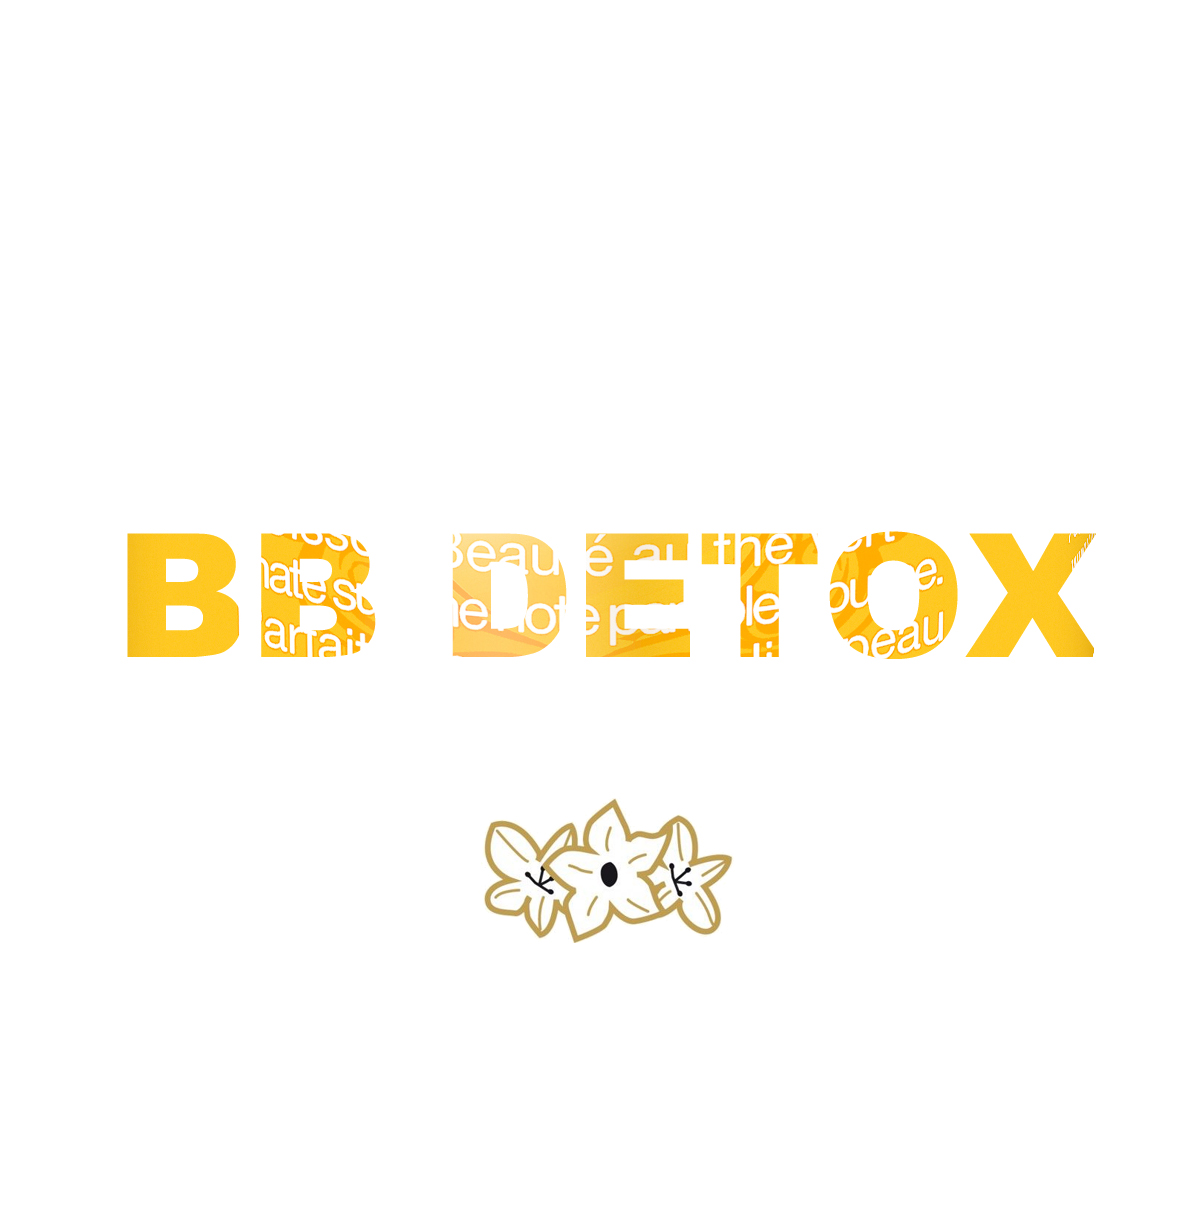 bb detox